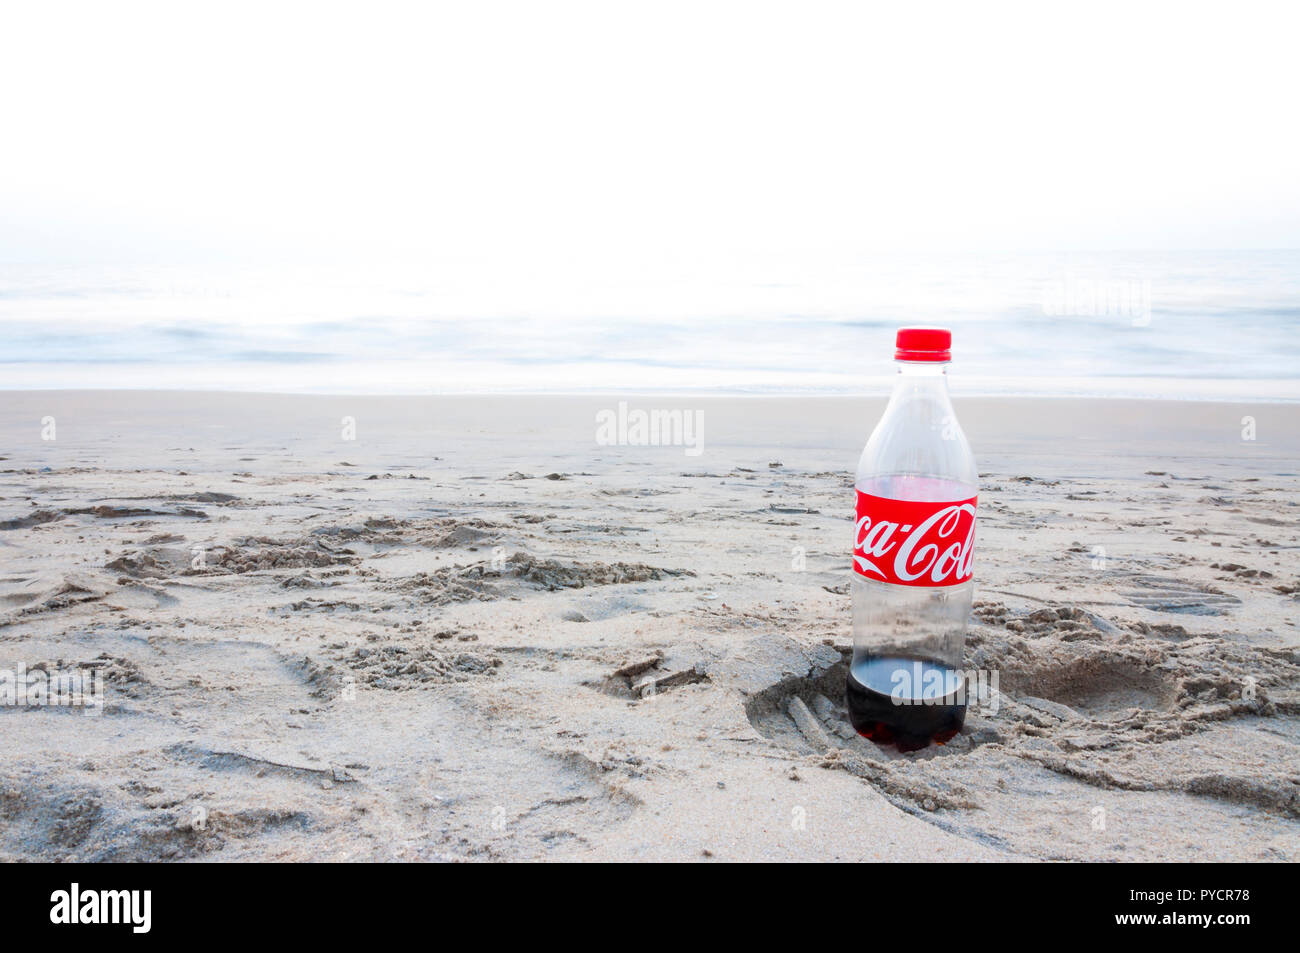 Kochi, Kerala, India - January 11, 2015: Almost empty plastic Coca Cola bottle left on a footprint in the sand on Arabian sea beach in Kochi. - Stock Image